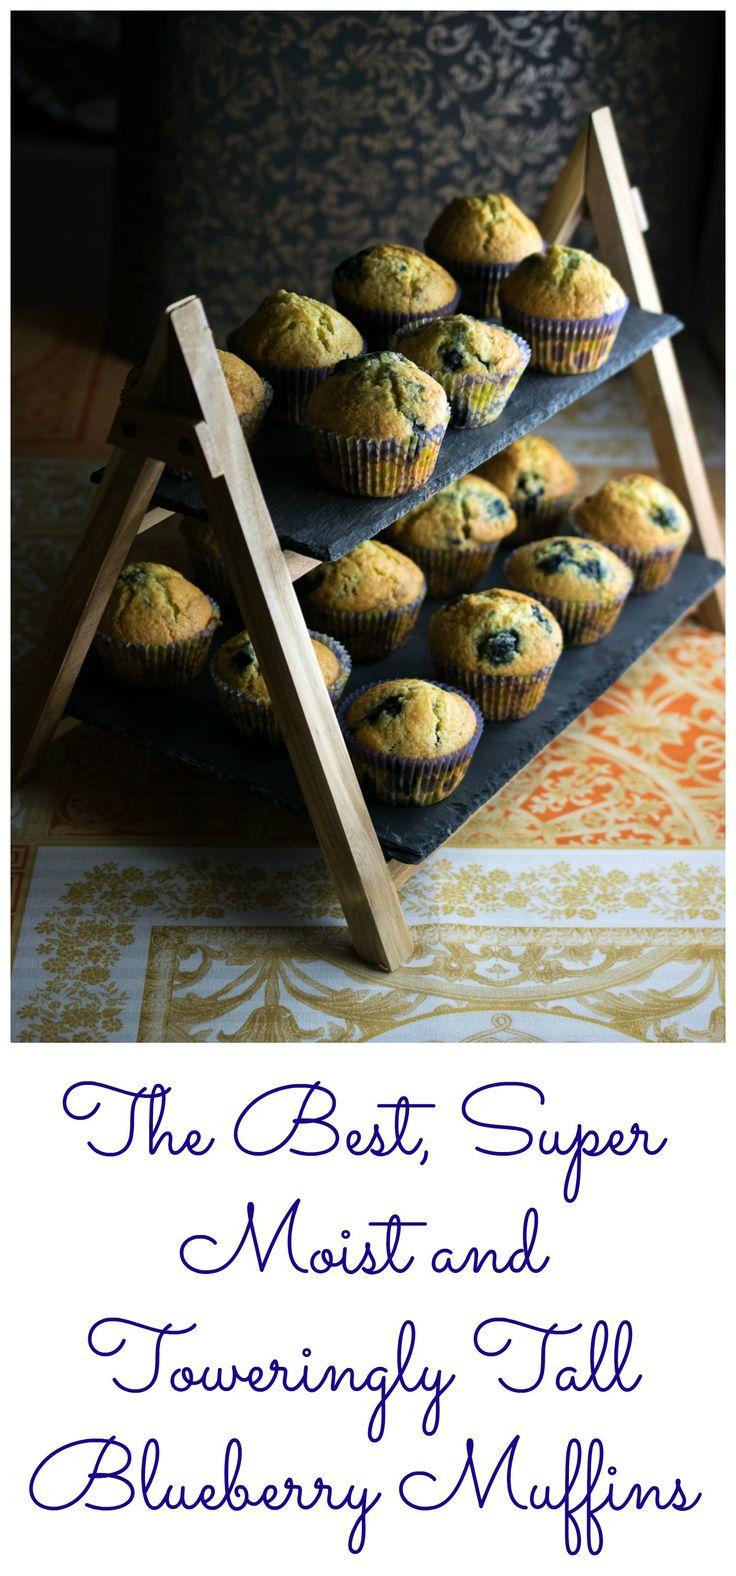 Blueberry Muffins - custard powder addition really nice. Needs salt and more sugar, next time add lemon?